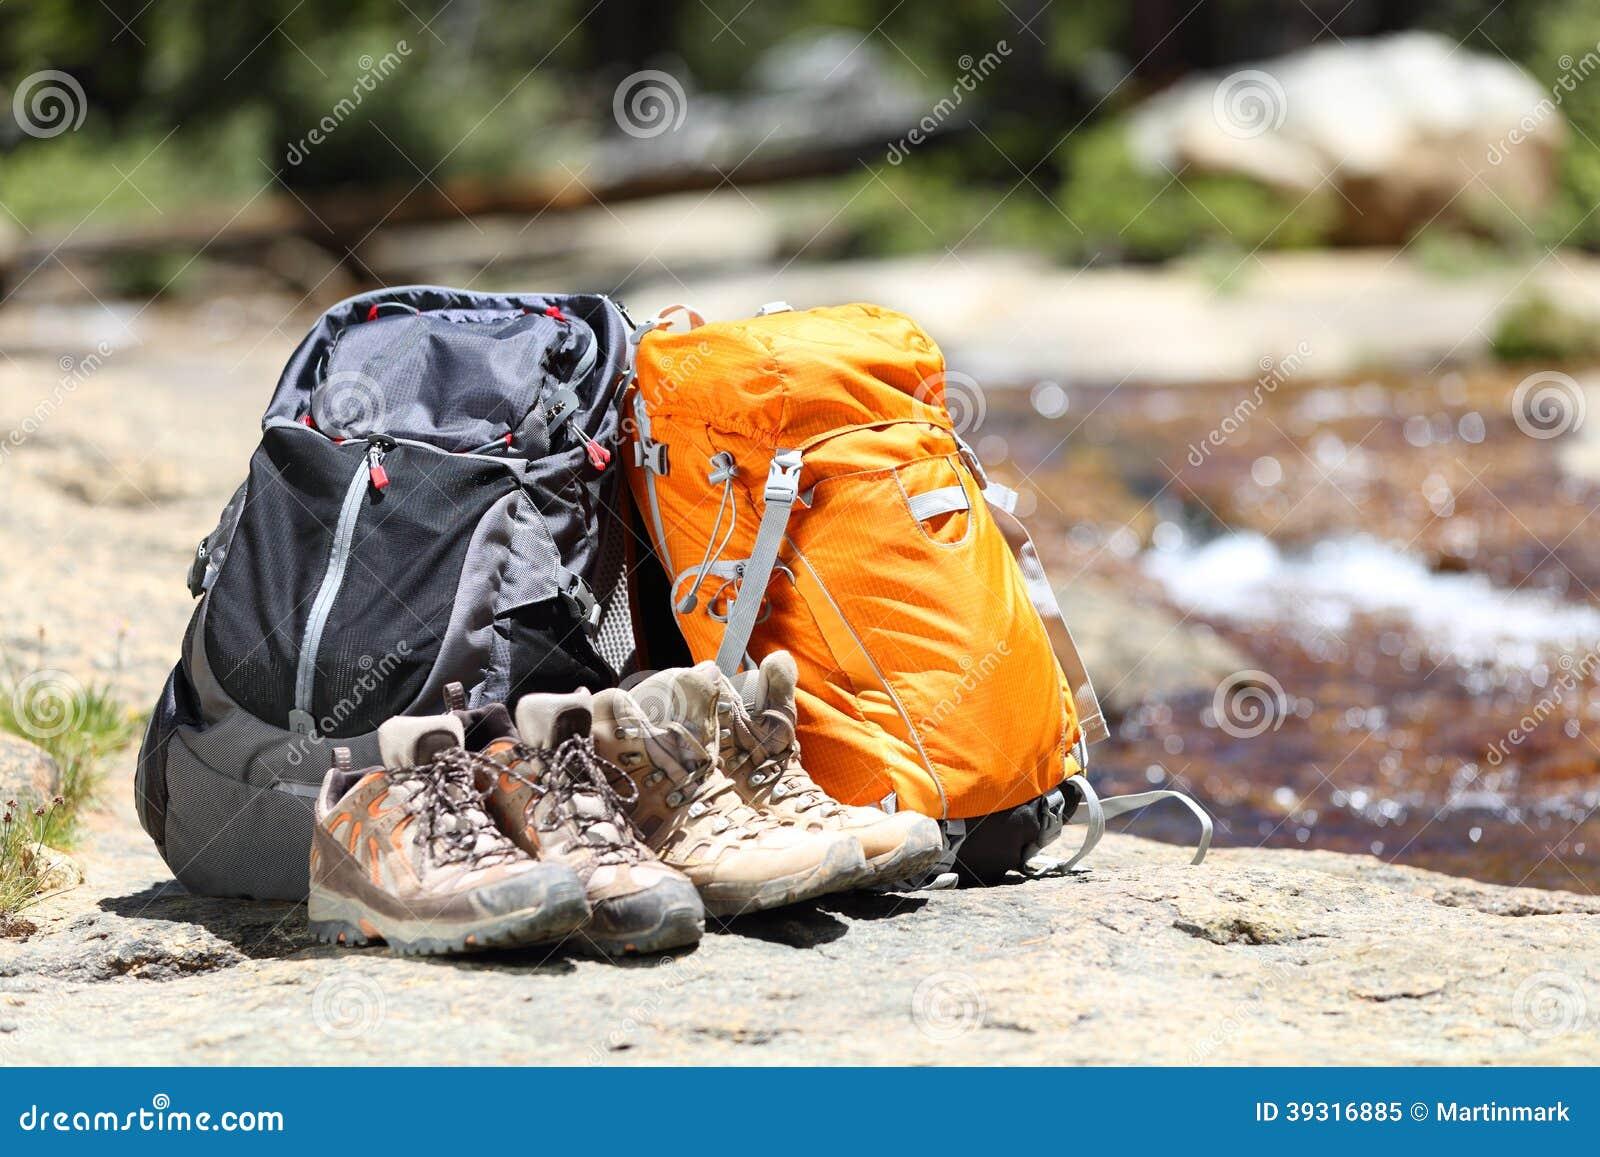 c8a42026dc Σακίδια πλάτης πεζοπορίας και παπούτσια οδοιπόρων Στοκ Εικόνα ...